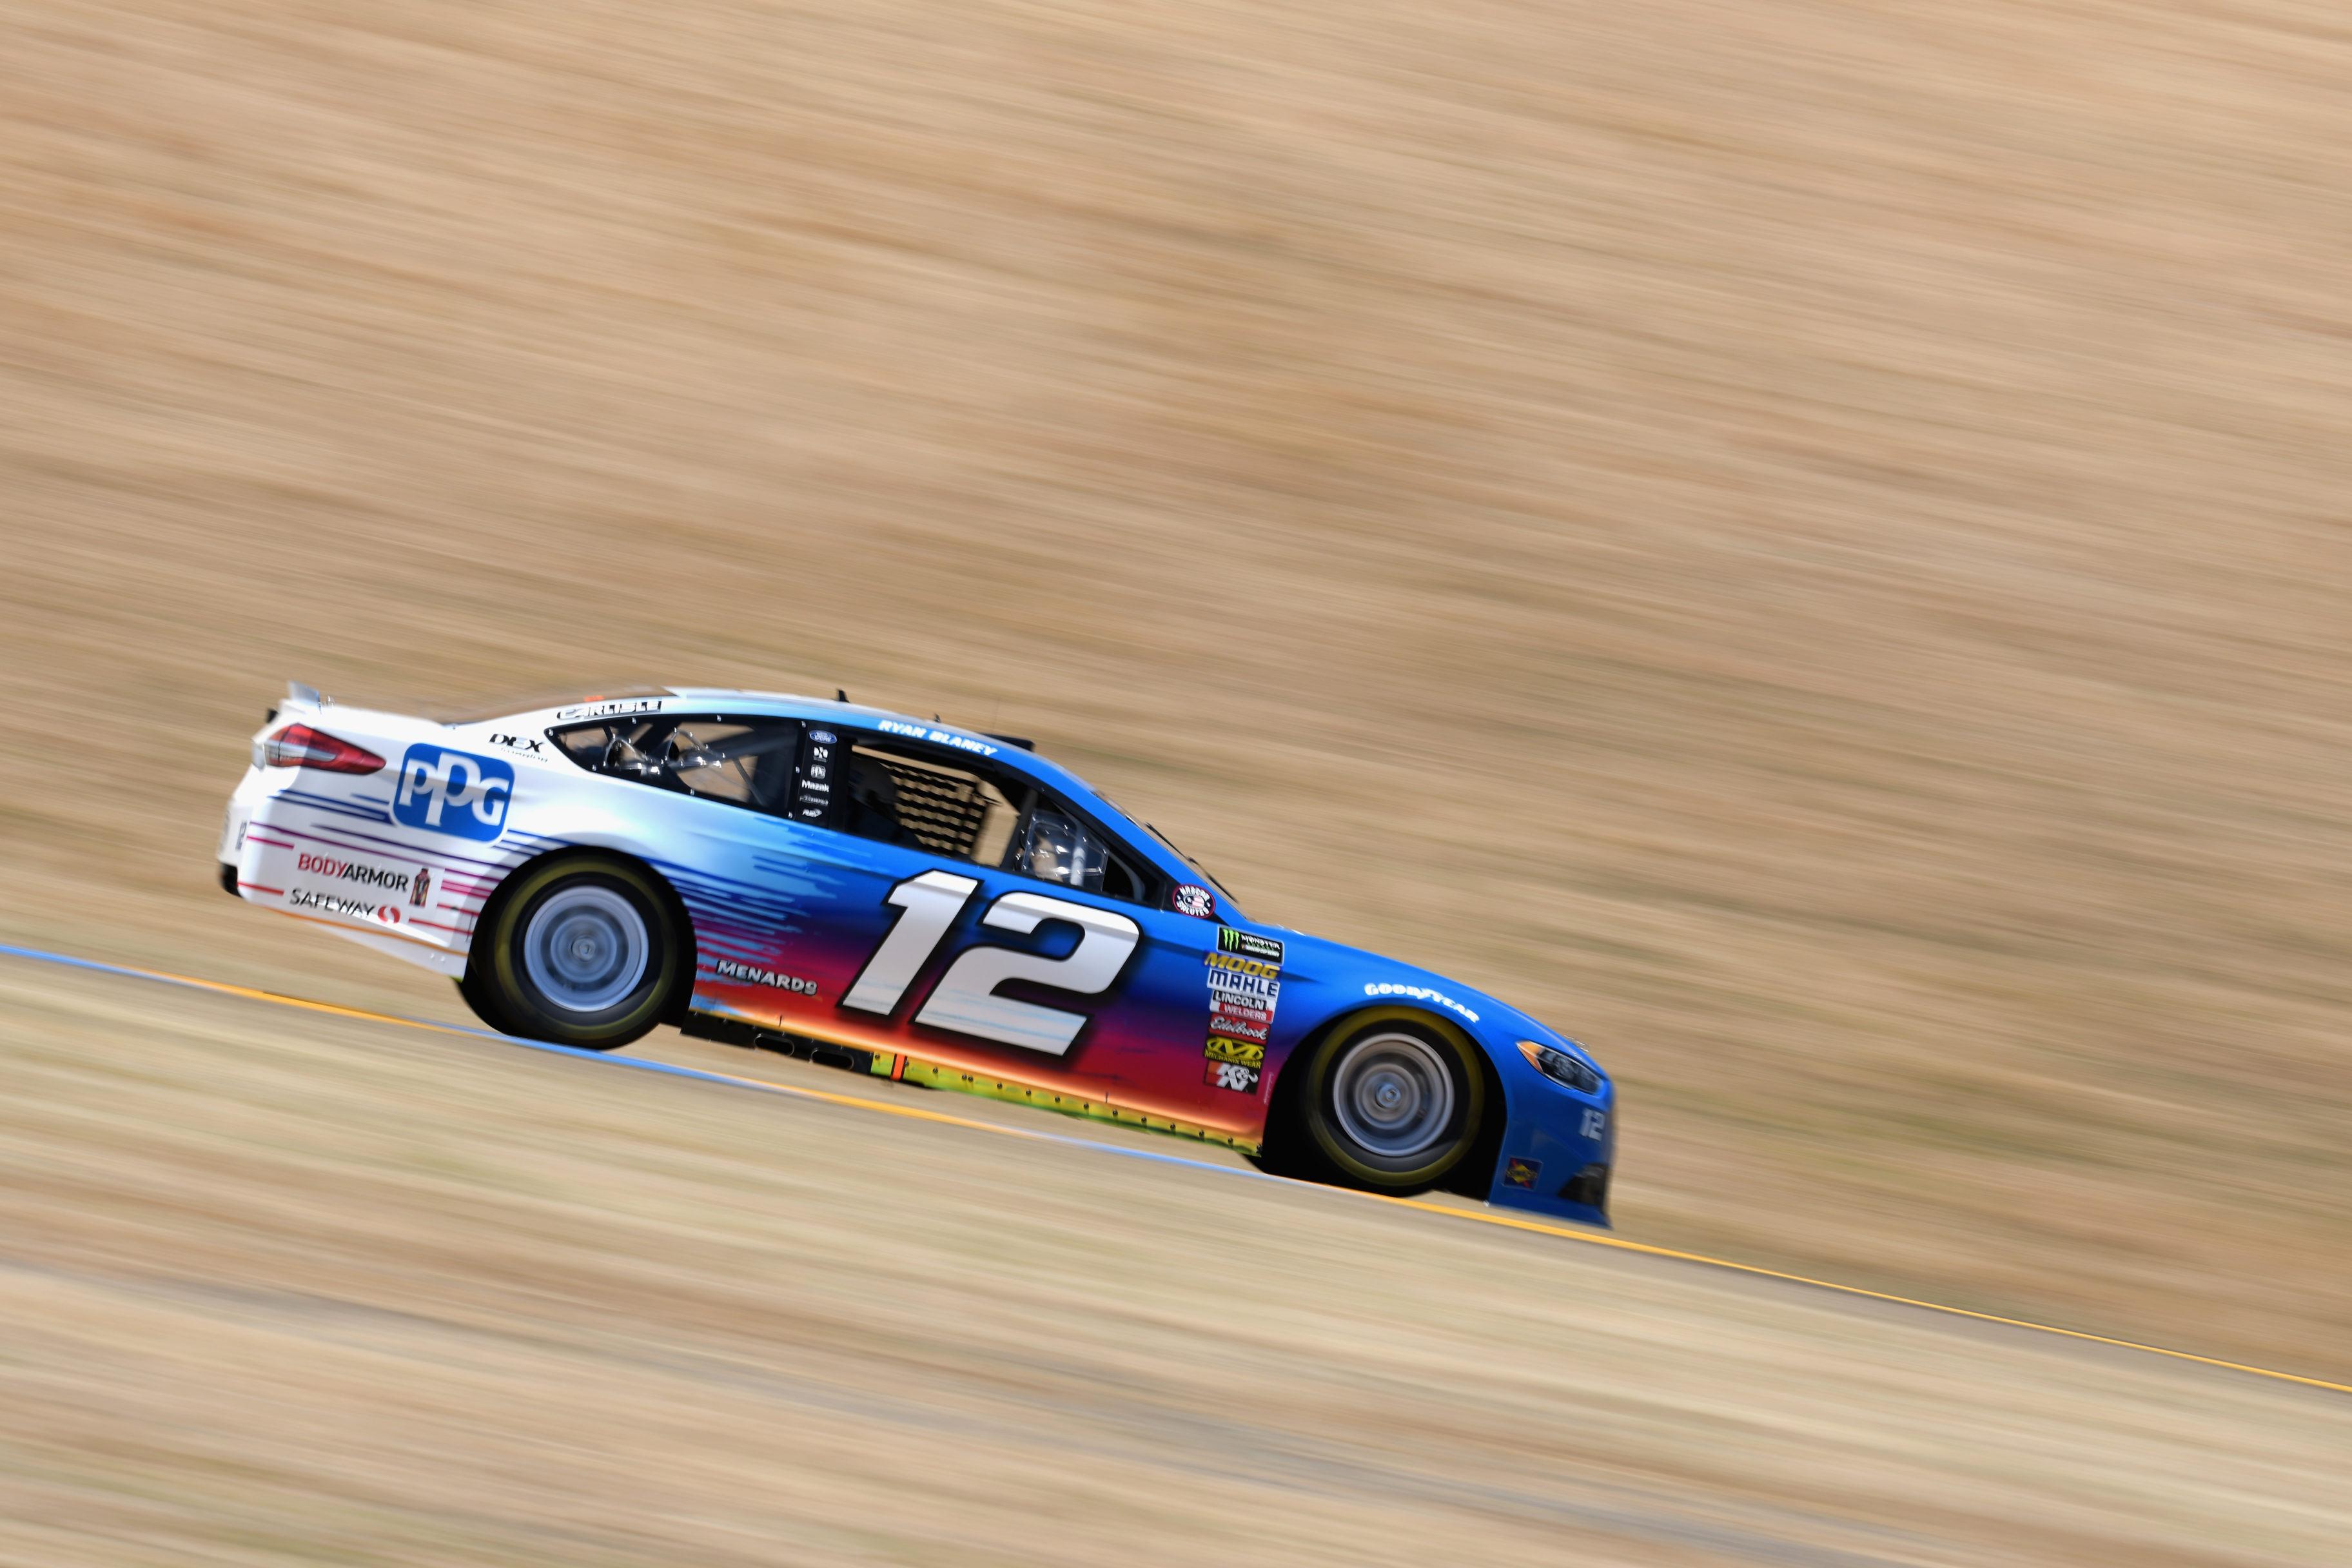 Ryan Blaney at Sonoma Raceway